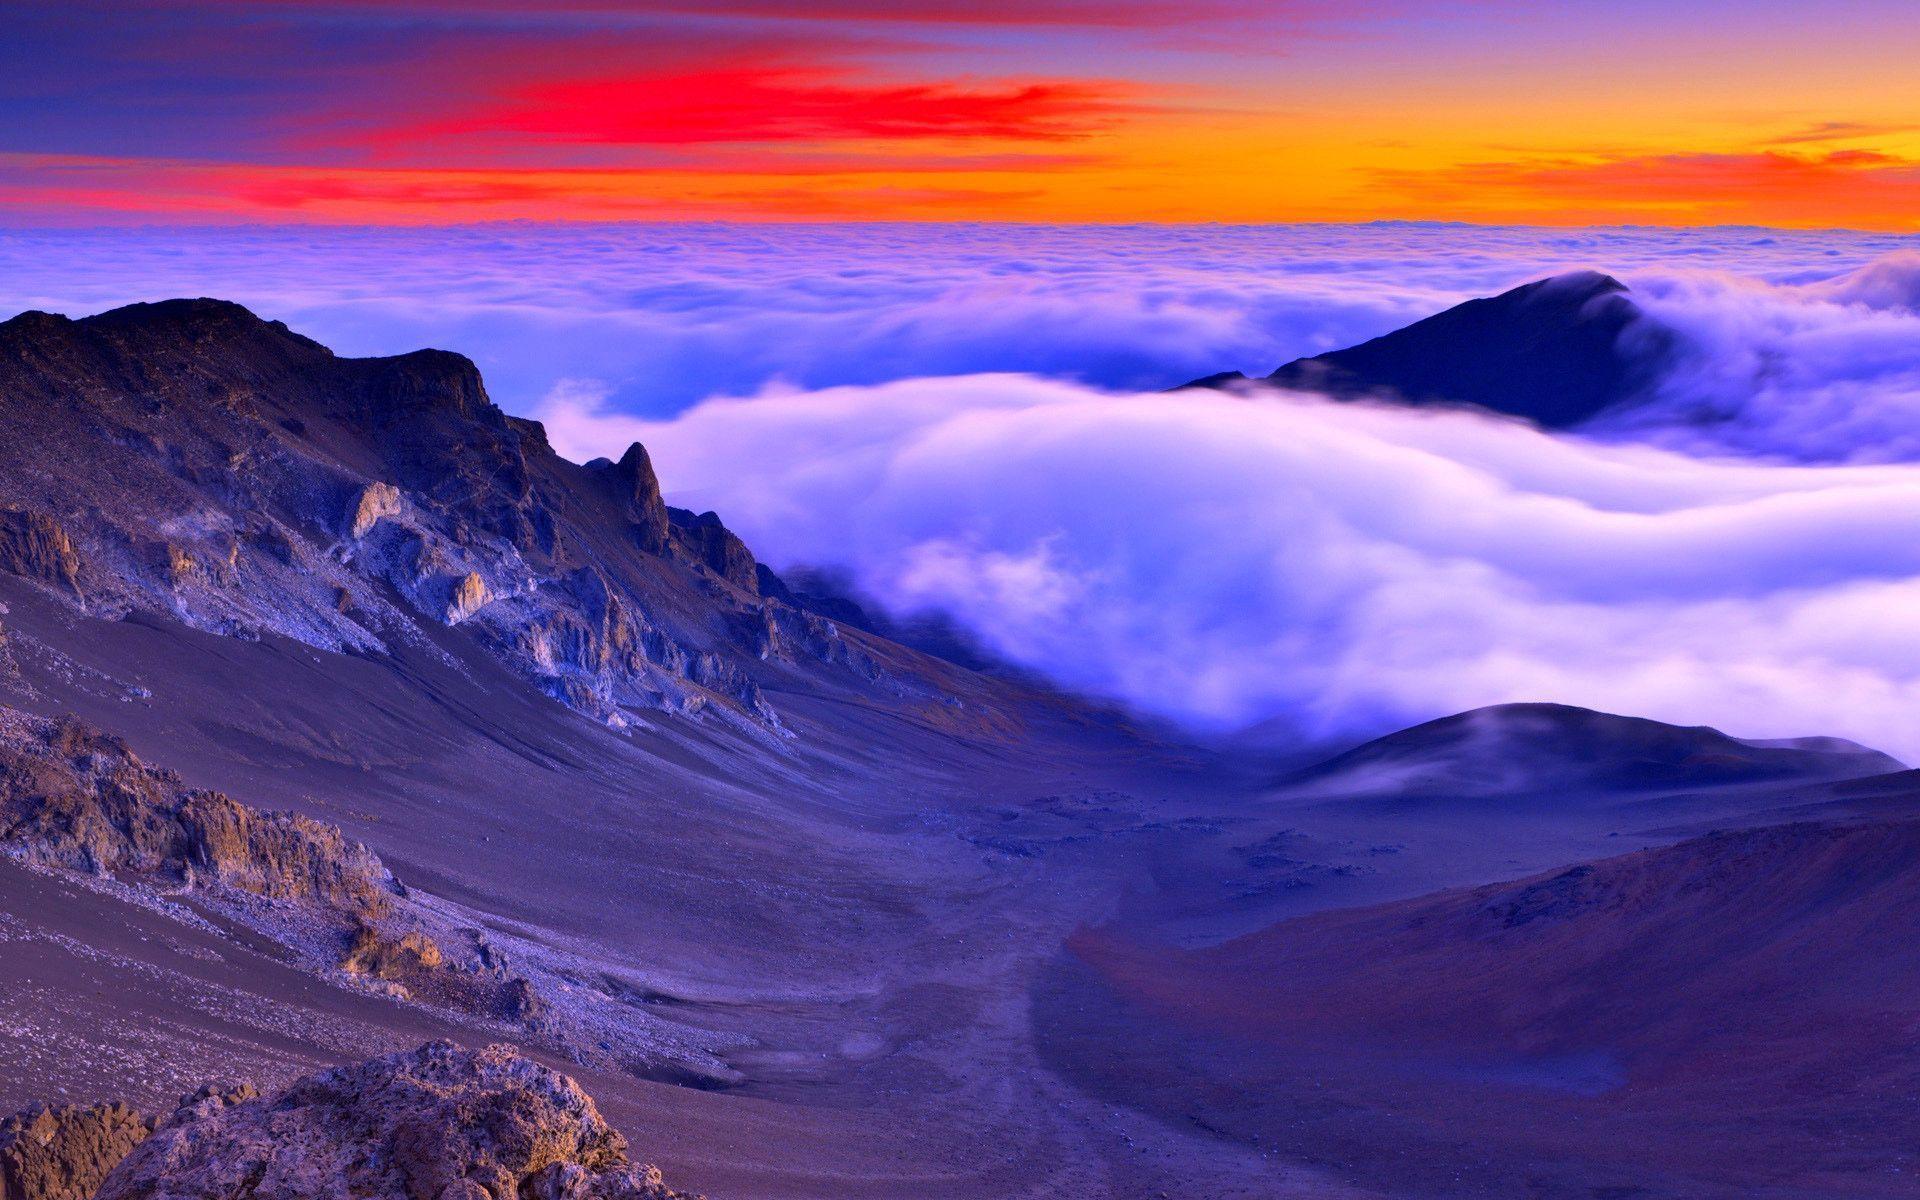 hawaii sunset amazing maui wallpapers nature background awesome mountain mountains name photographs highland lake jebel montane hi volcano haleakala hawai